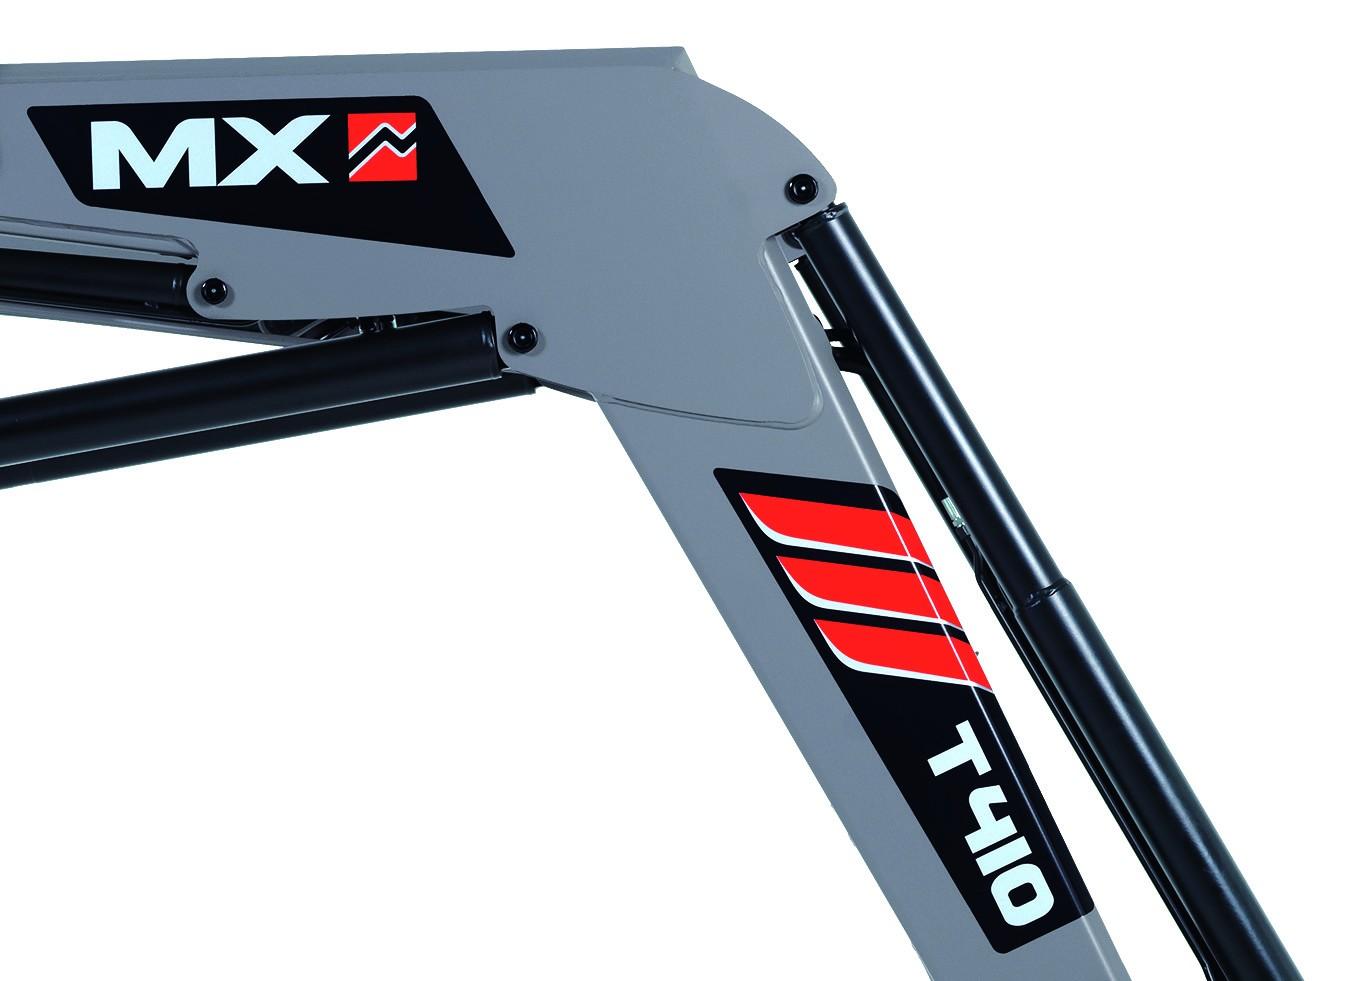 Pala cargadora frontal marca MX modelo T400